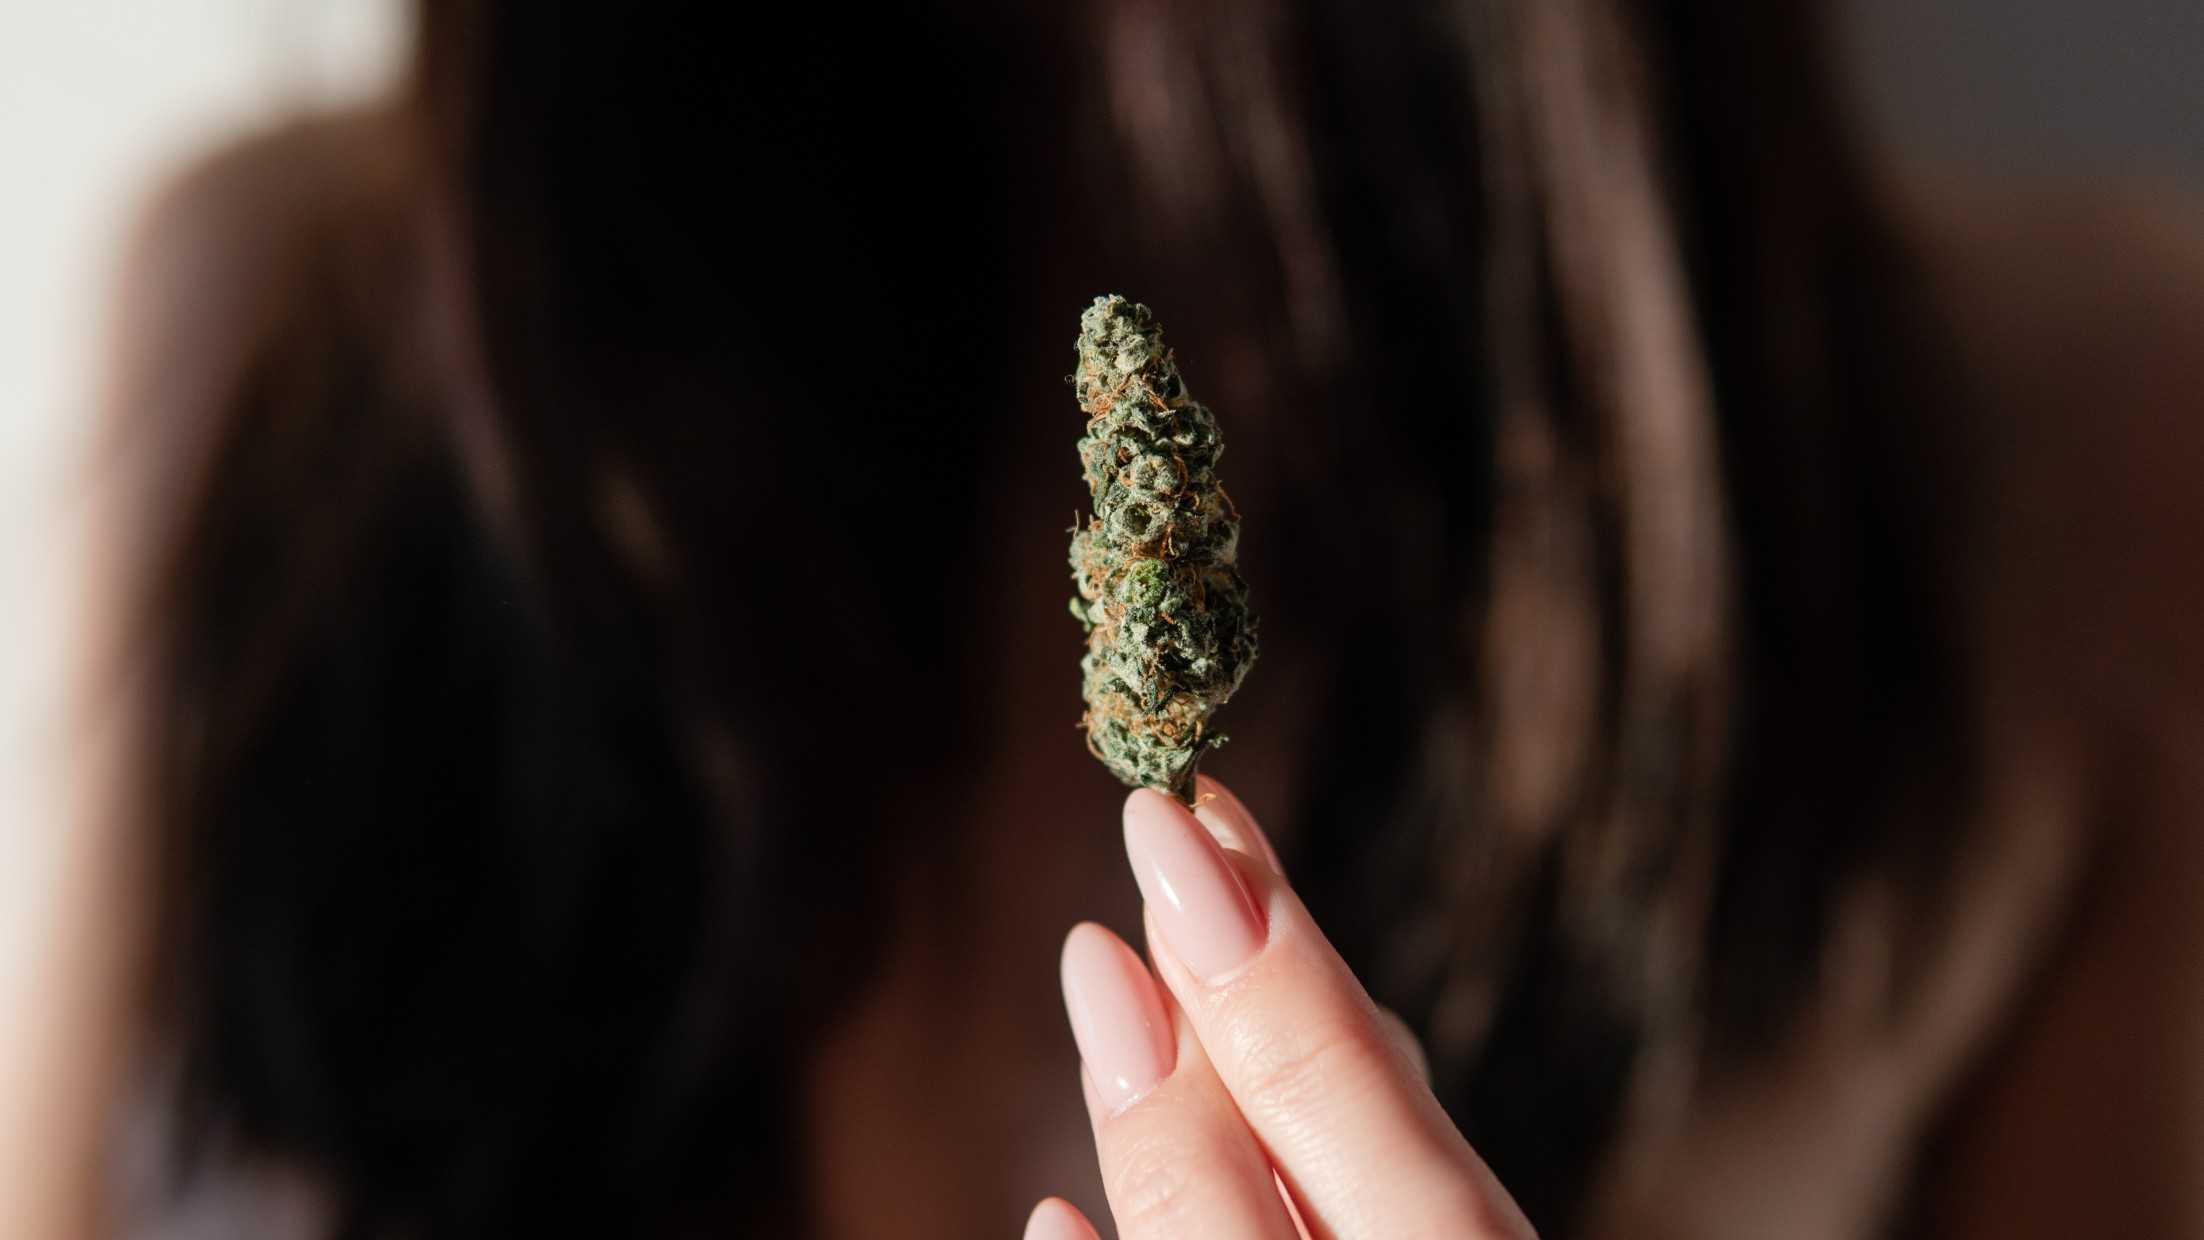 medical-marijuana-plant-in-hands